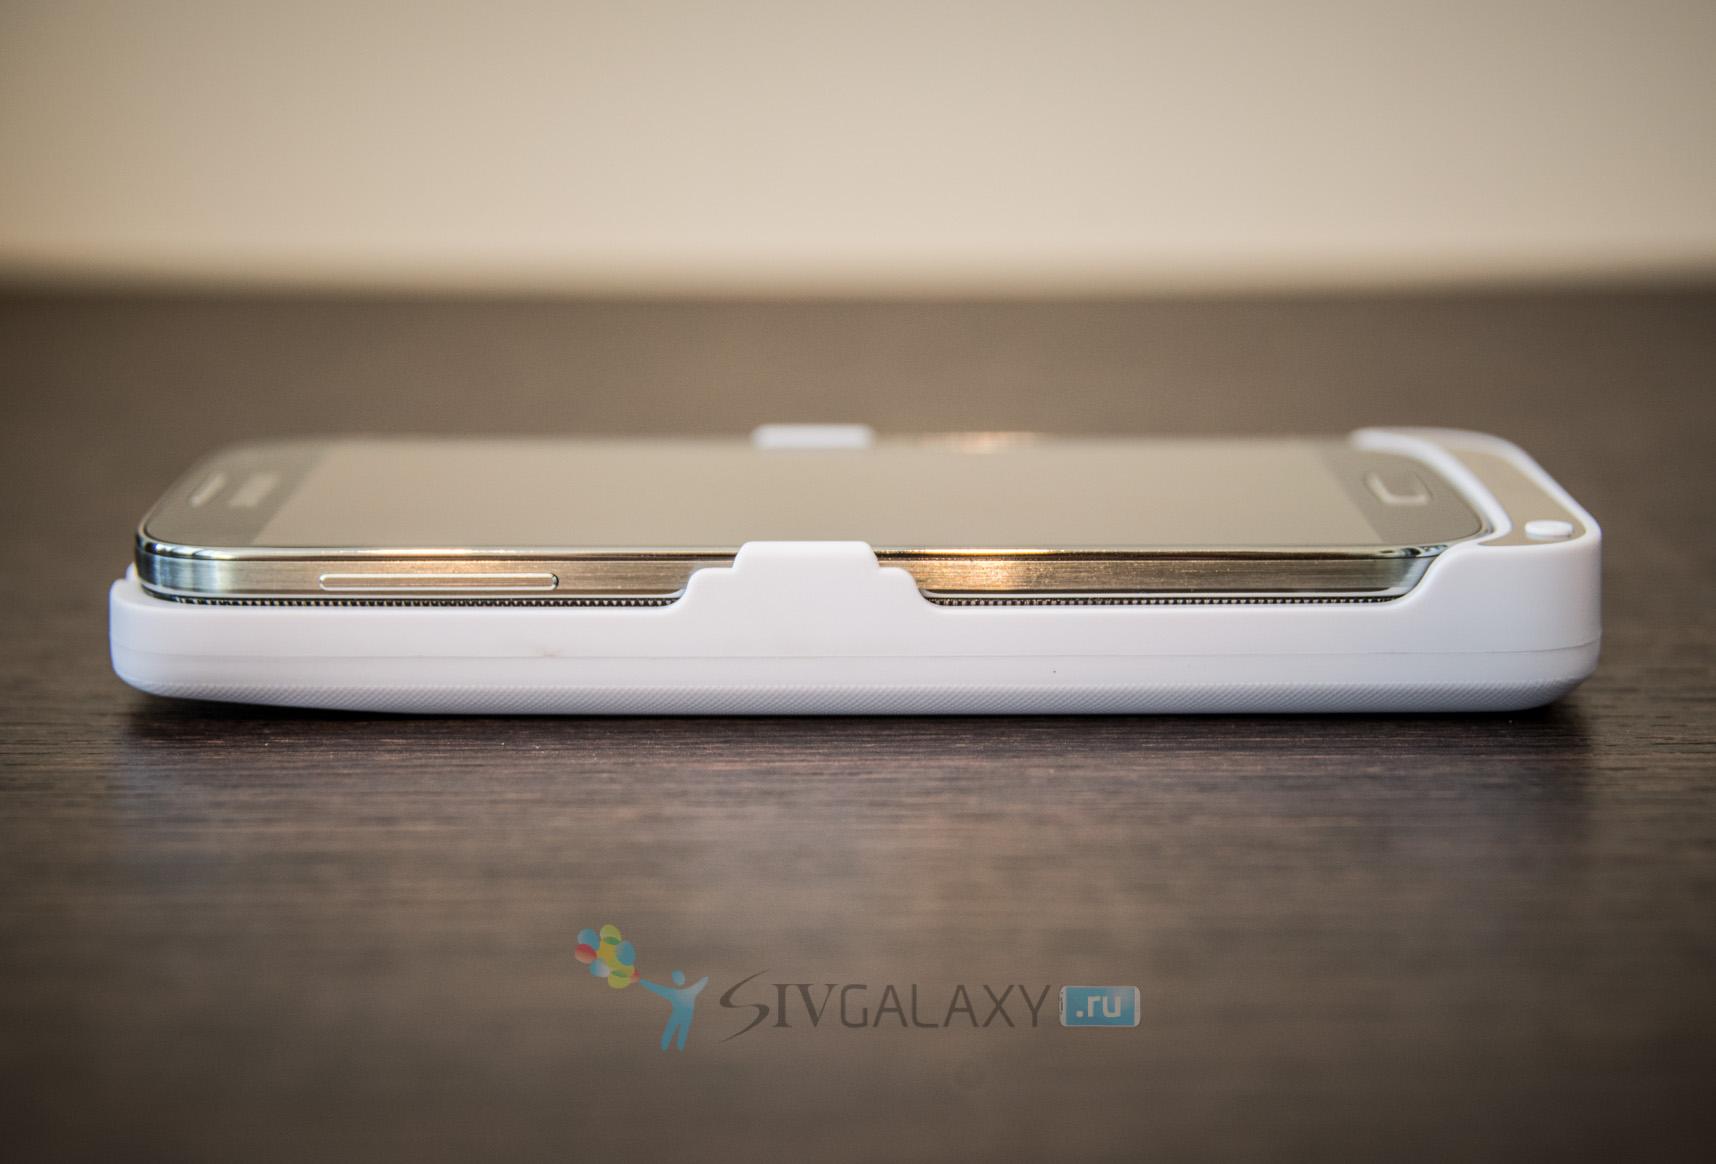 Кейс с аккумулятором для Samsung Galaxy S4 - левая грань